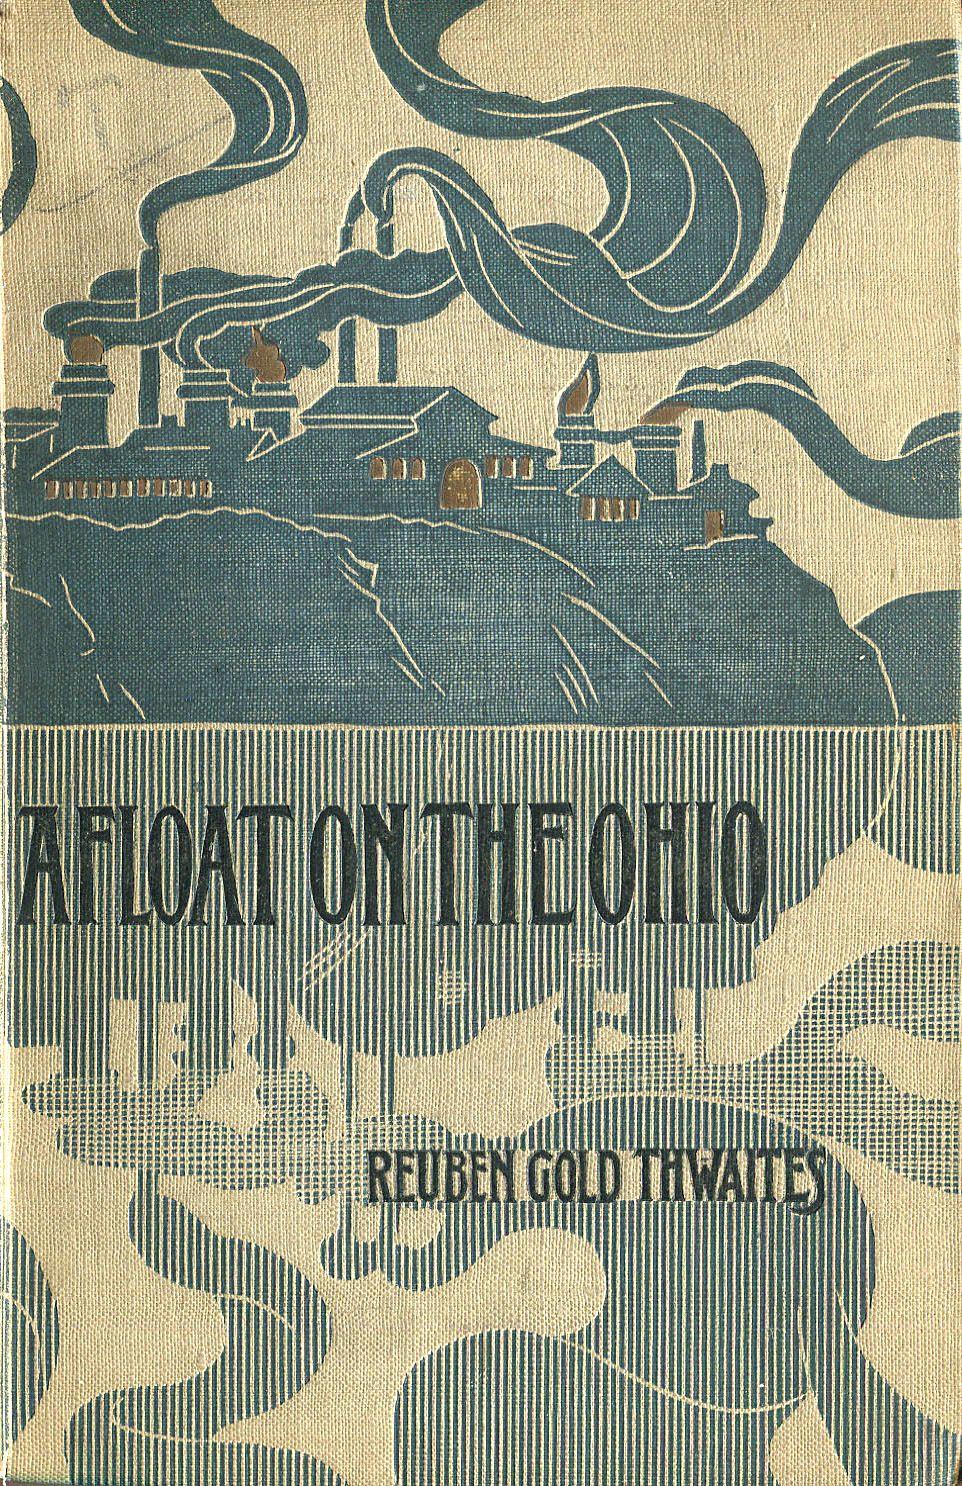 'Afloat on the Ohio' by Reuben Gold Thwaites. Way & Williams, Chicago, 1897